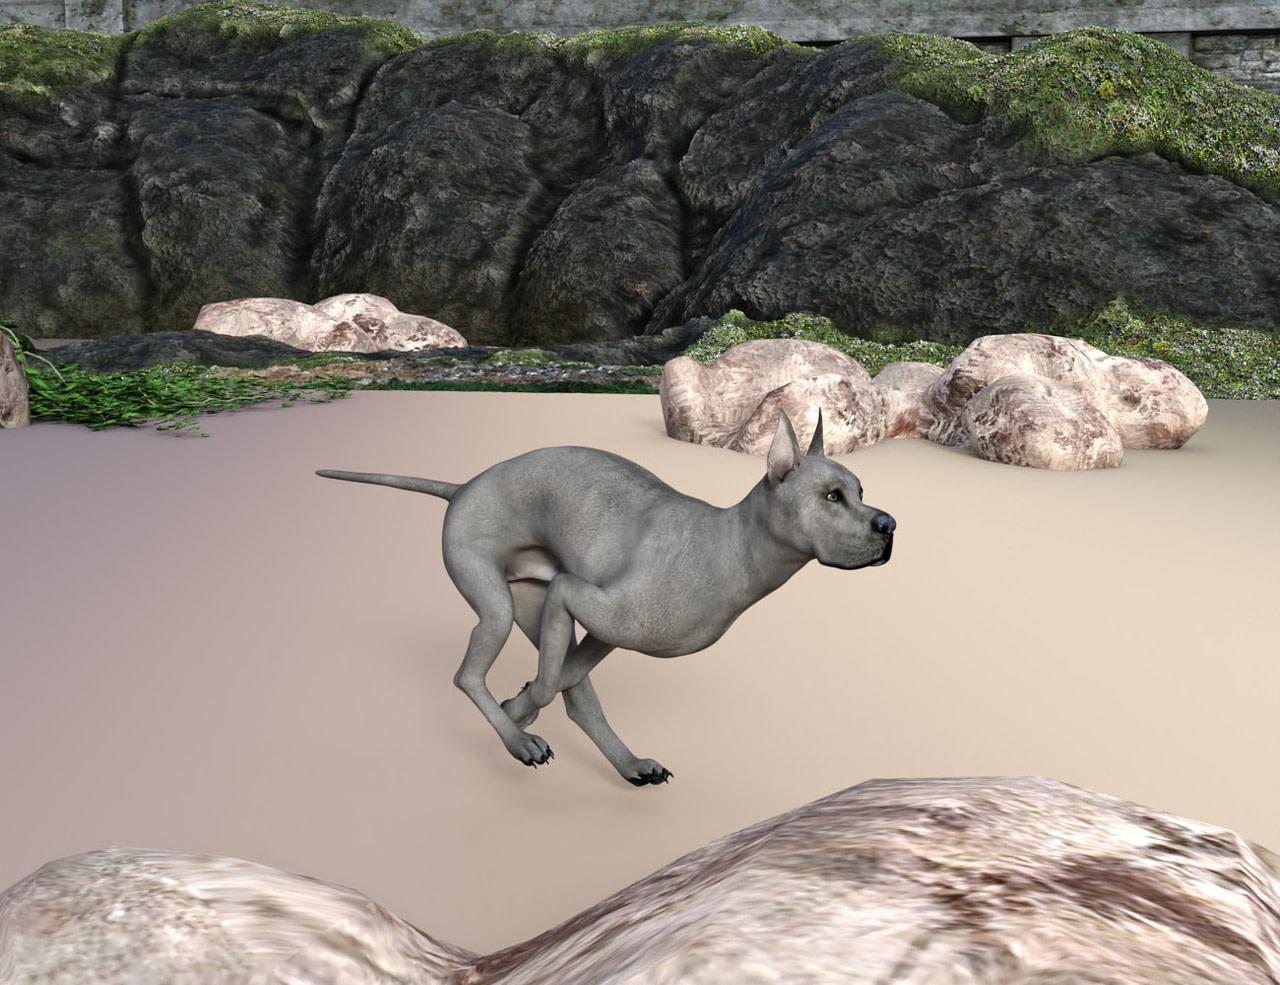 daz studio animation of a running dog